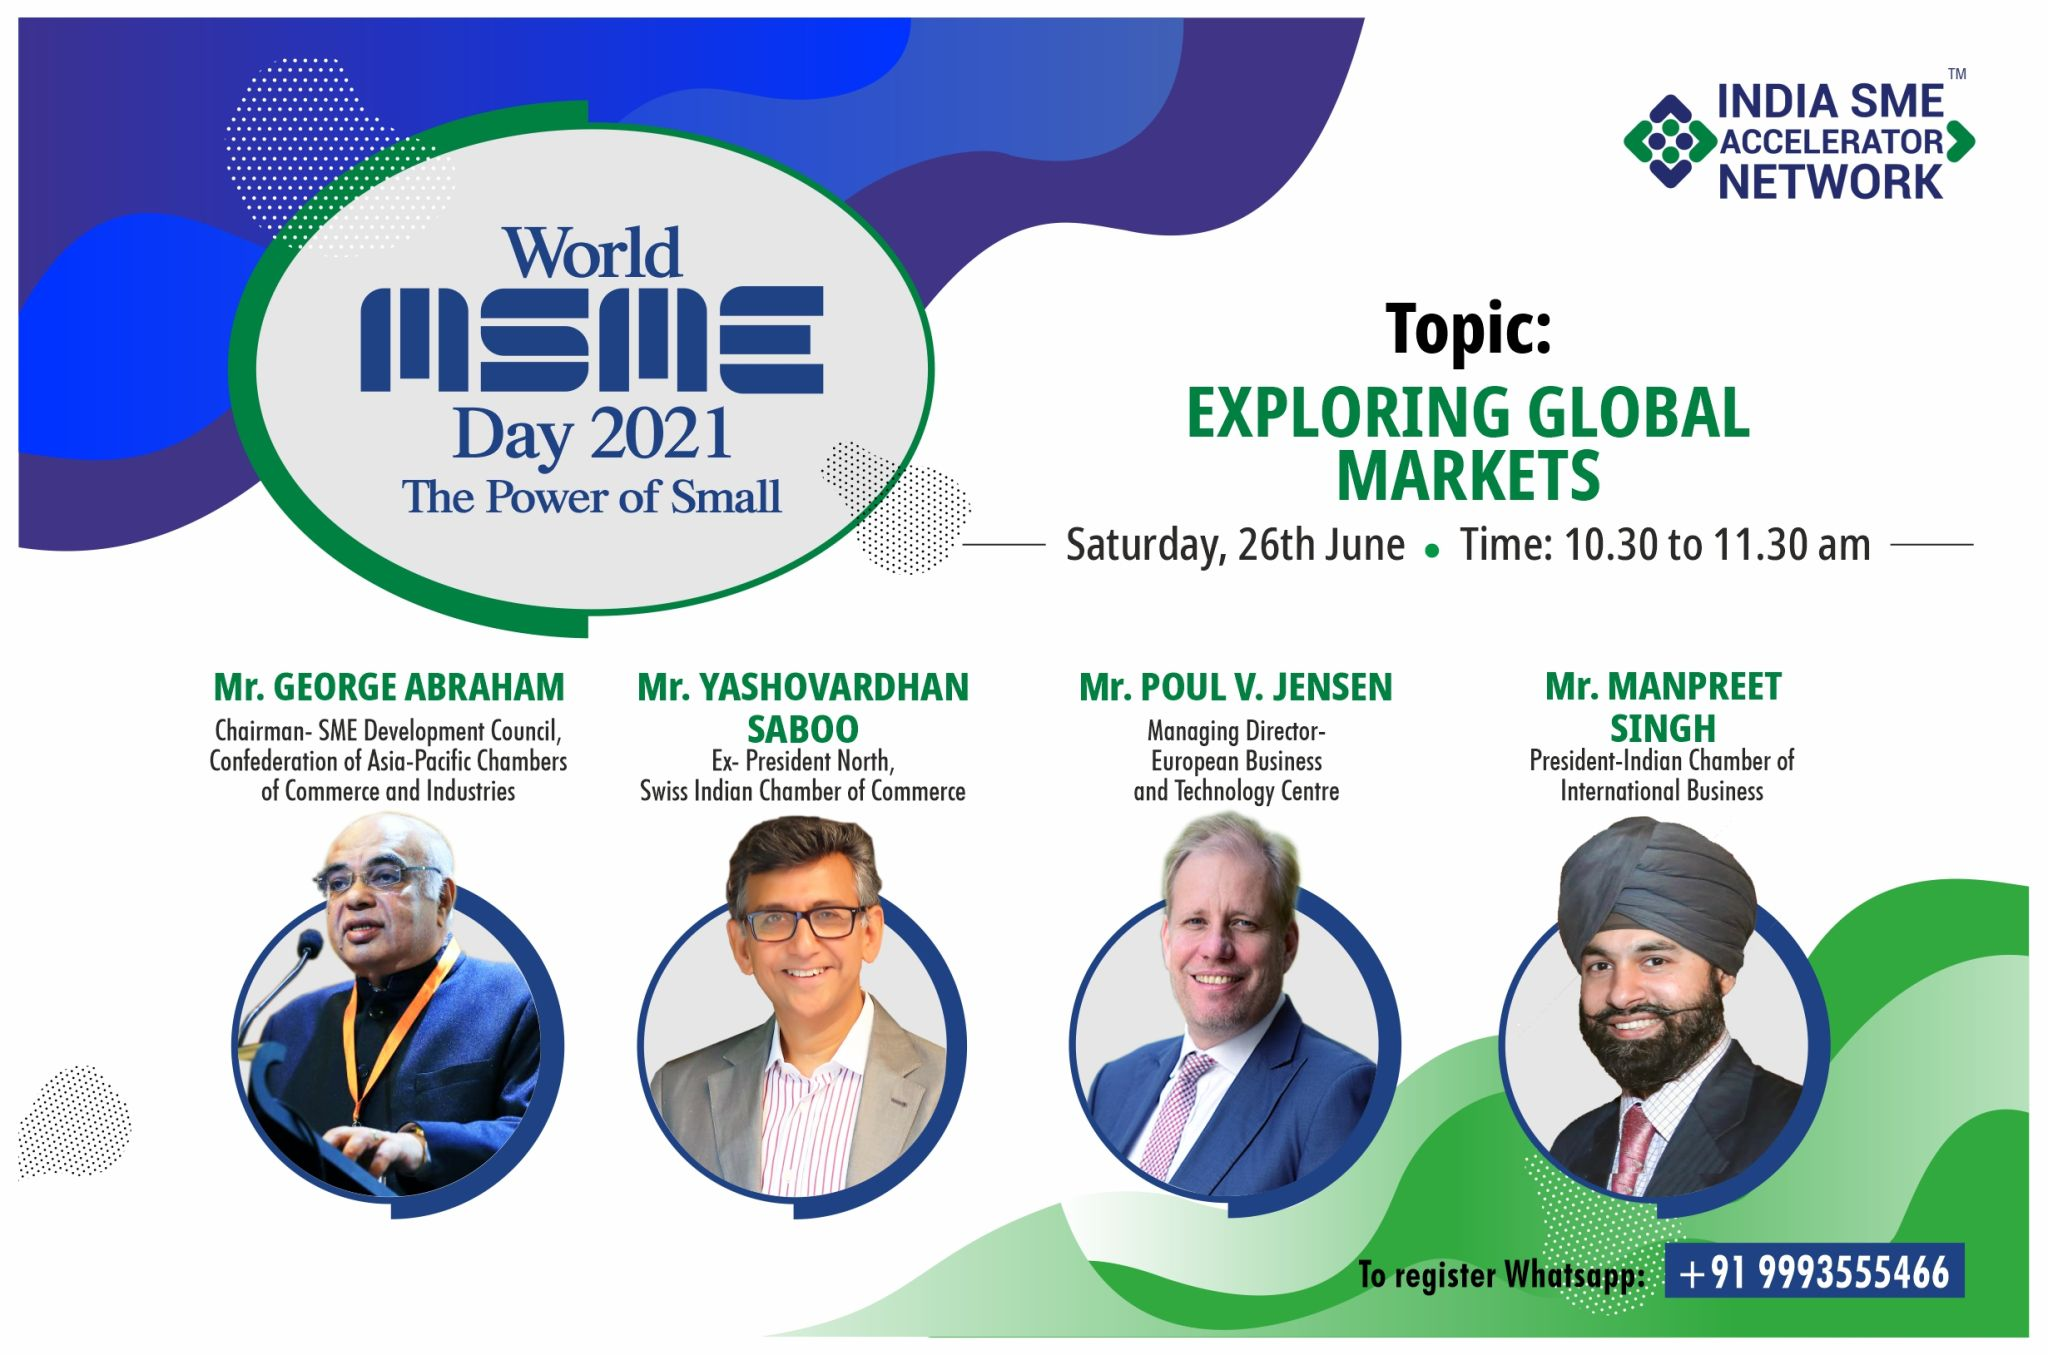 World MSME Day 2021